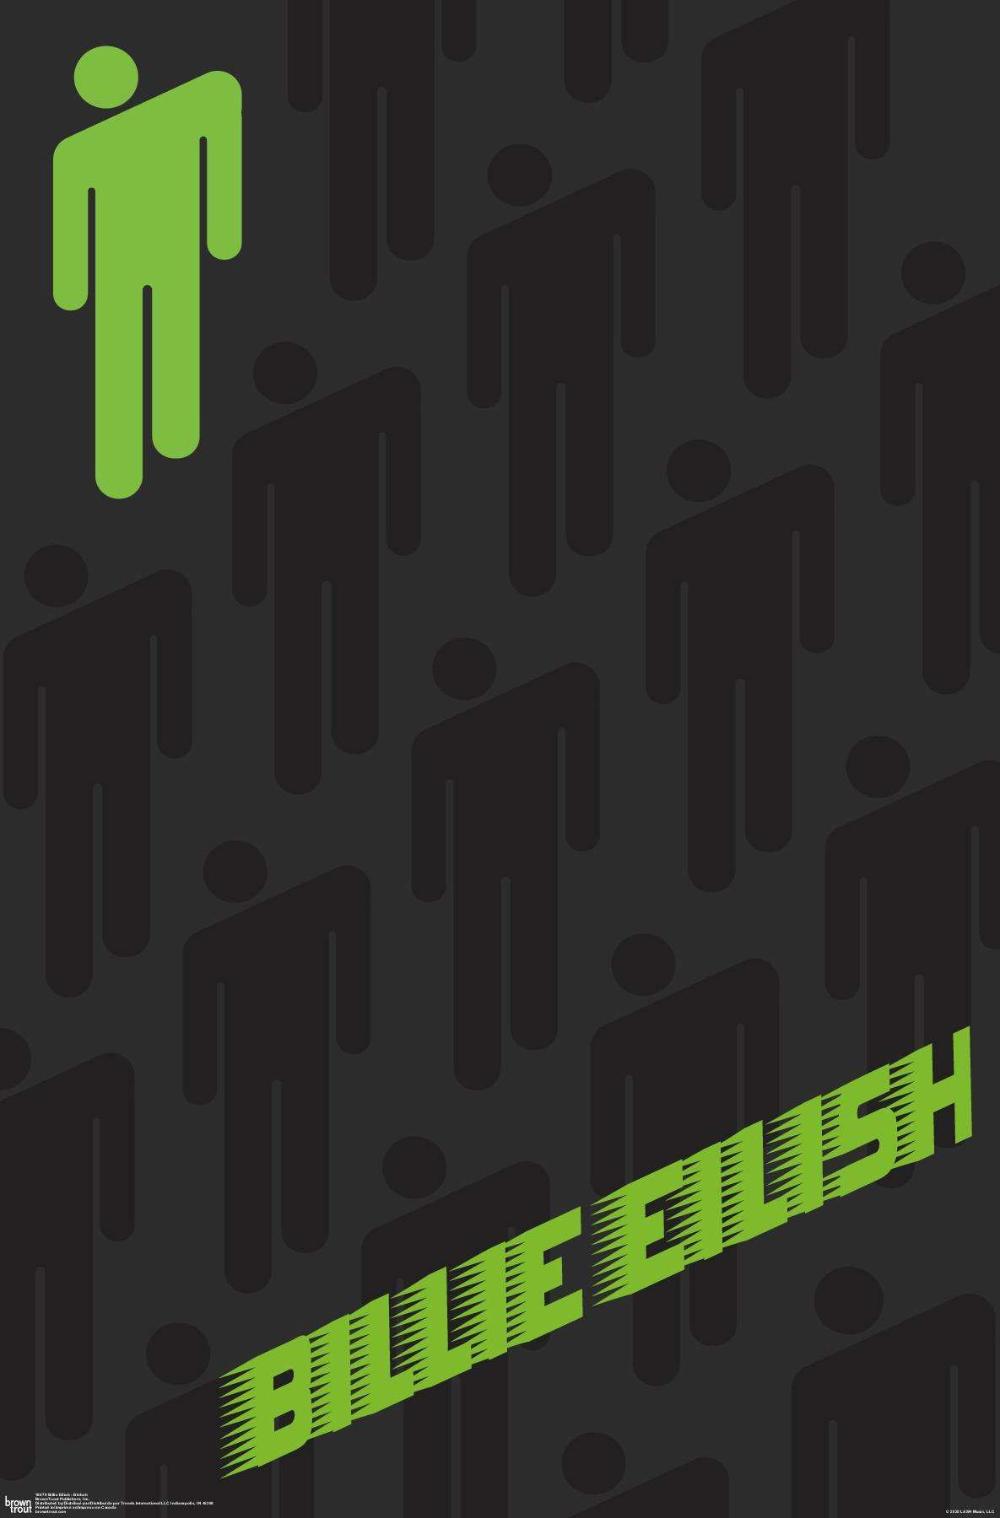 Billie Eilish Blohsh In 2020 Billie Eilish Billie Aesthetic Wallpapers